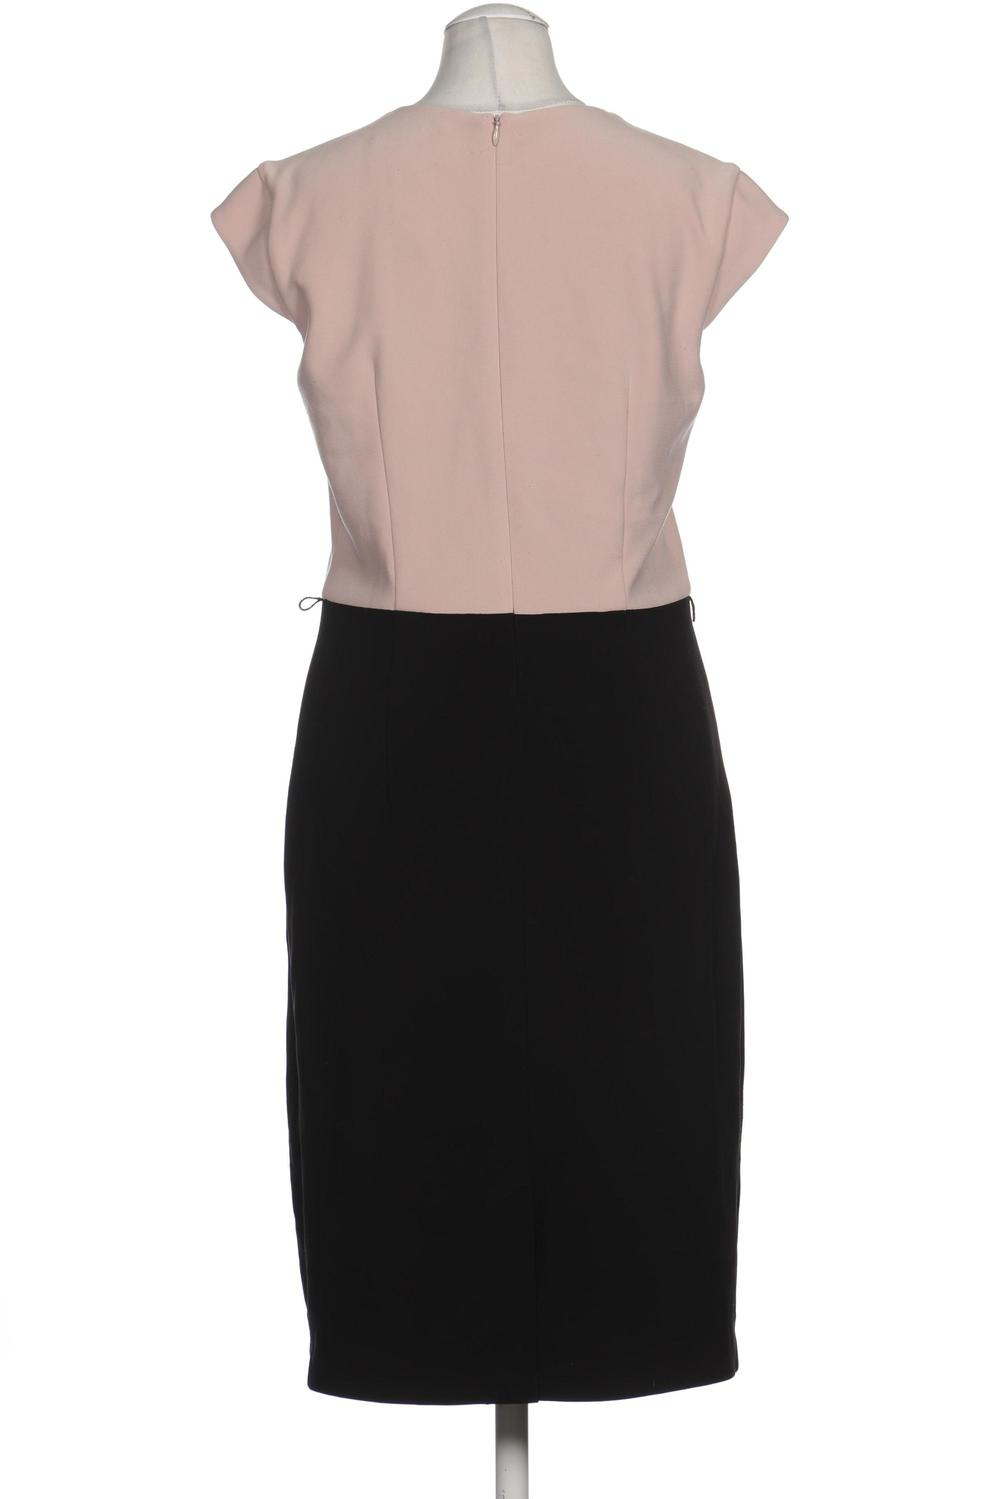 Joseph Ribkoff Damen Kleid US 4 Second Hand kaufen | ubup